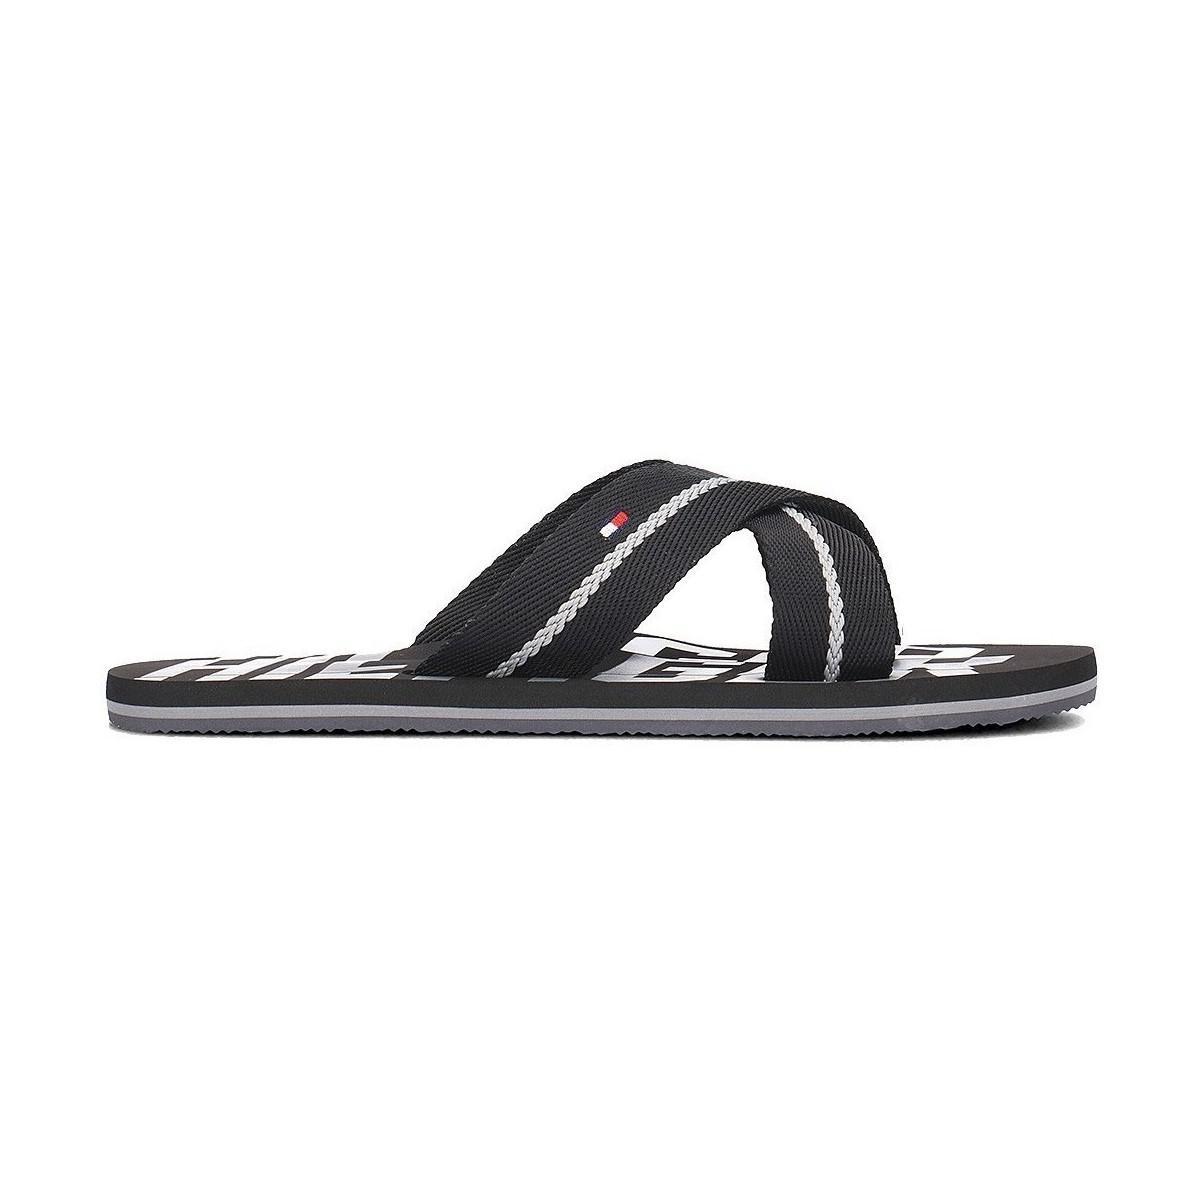 62a712ee6 Tommy Hilfiger Cross Strap Beach Sandals Black Men s Flip Flops ...